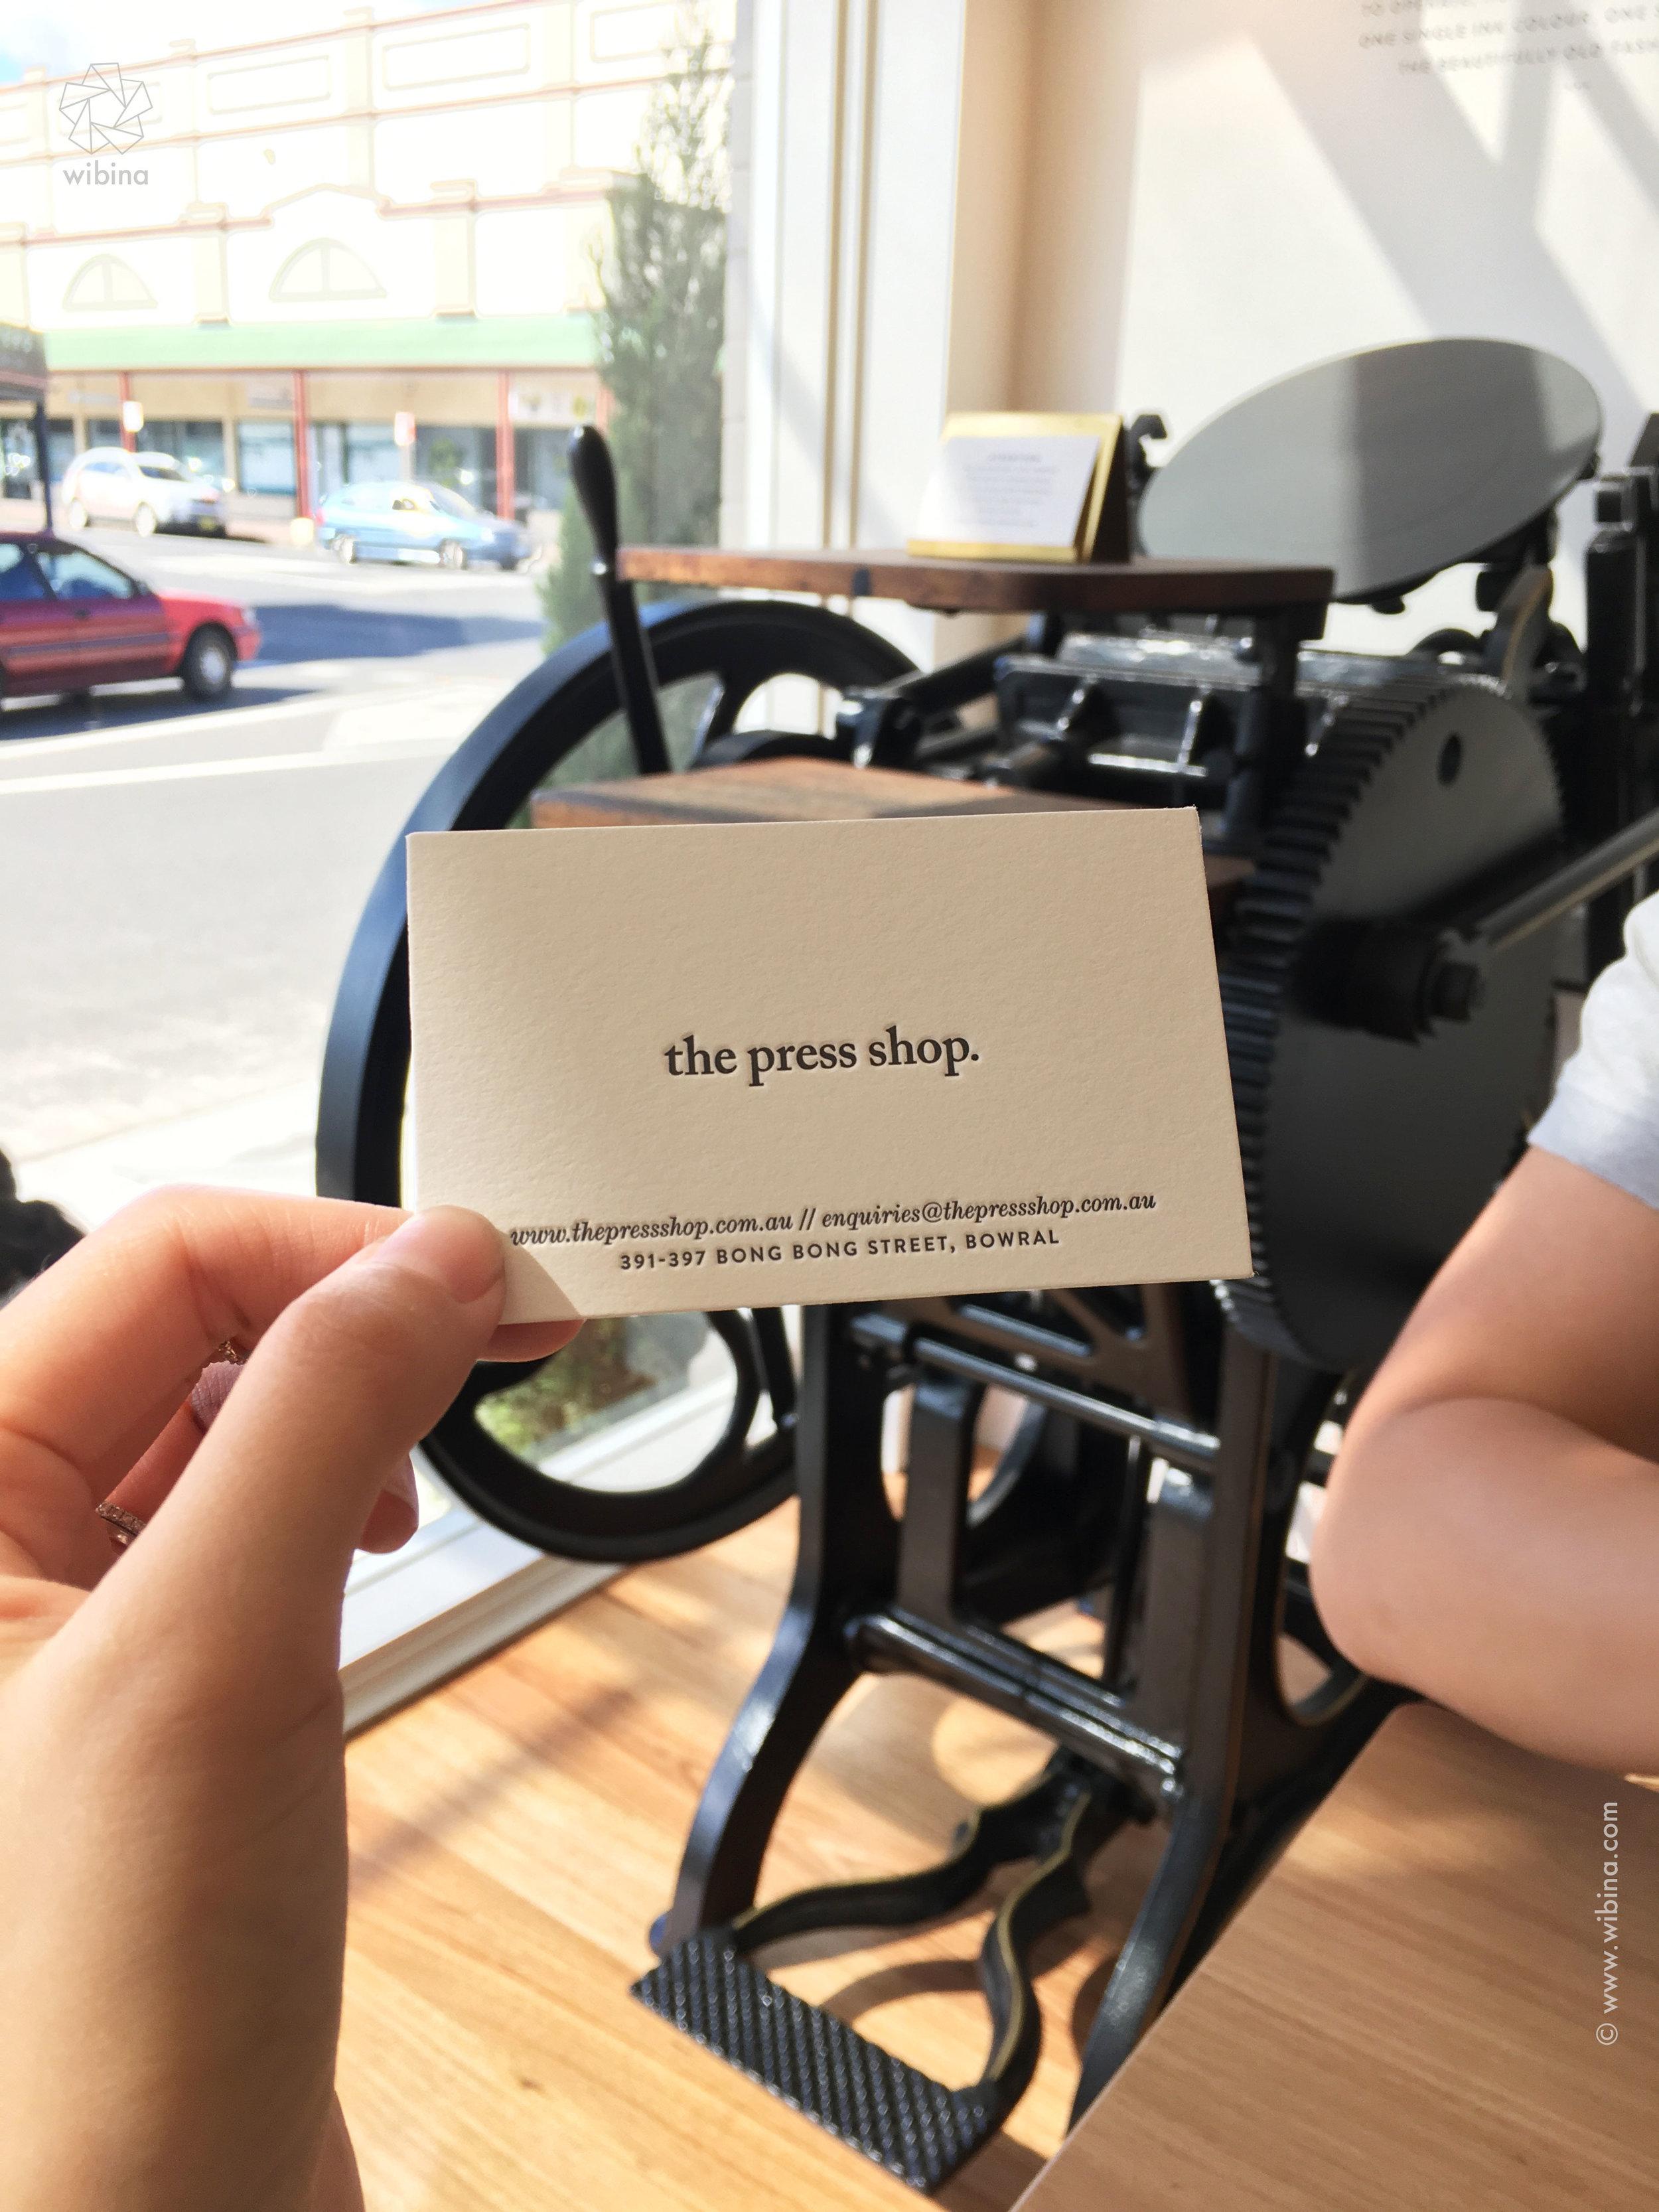 Wibina-Bowral-The_Press_Shop_21.jpg